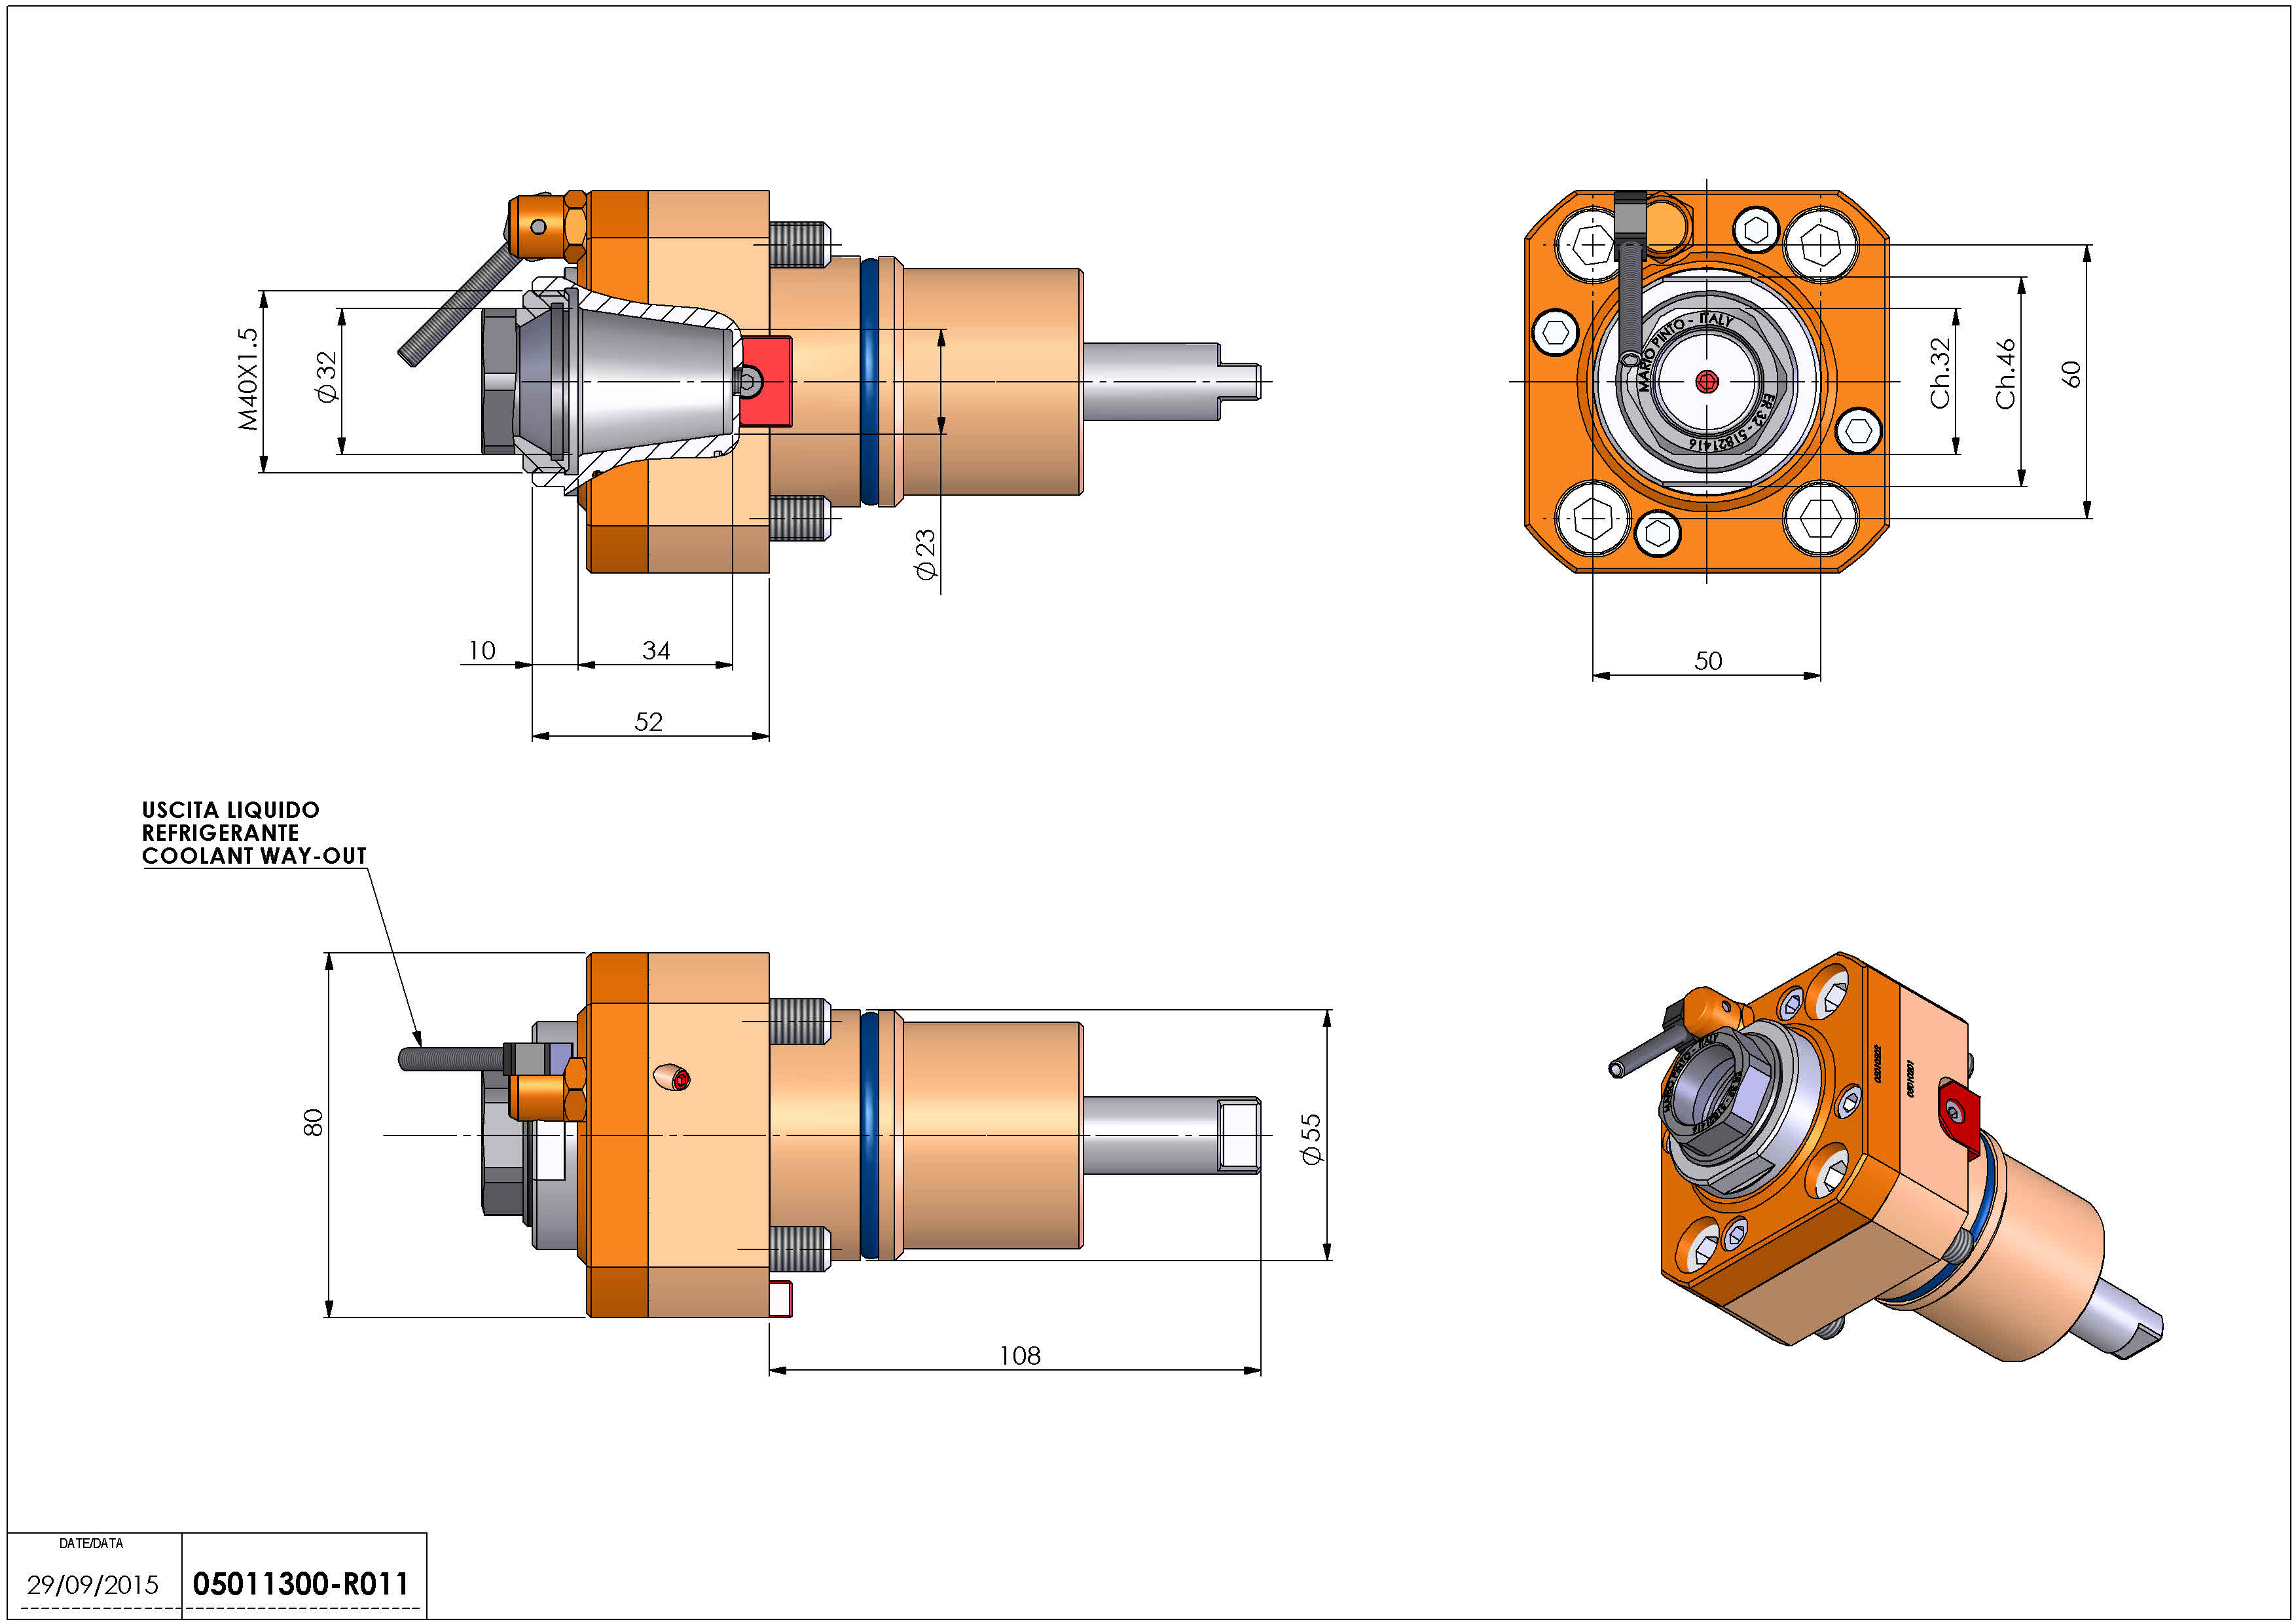 Technical image - LT-S D55 ER32F H52 NK.